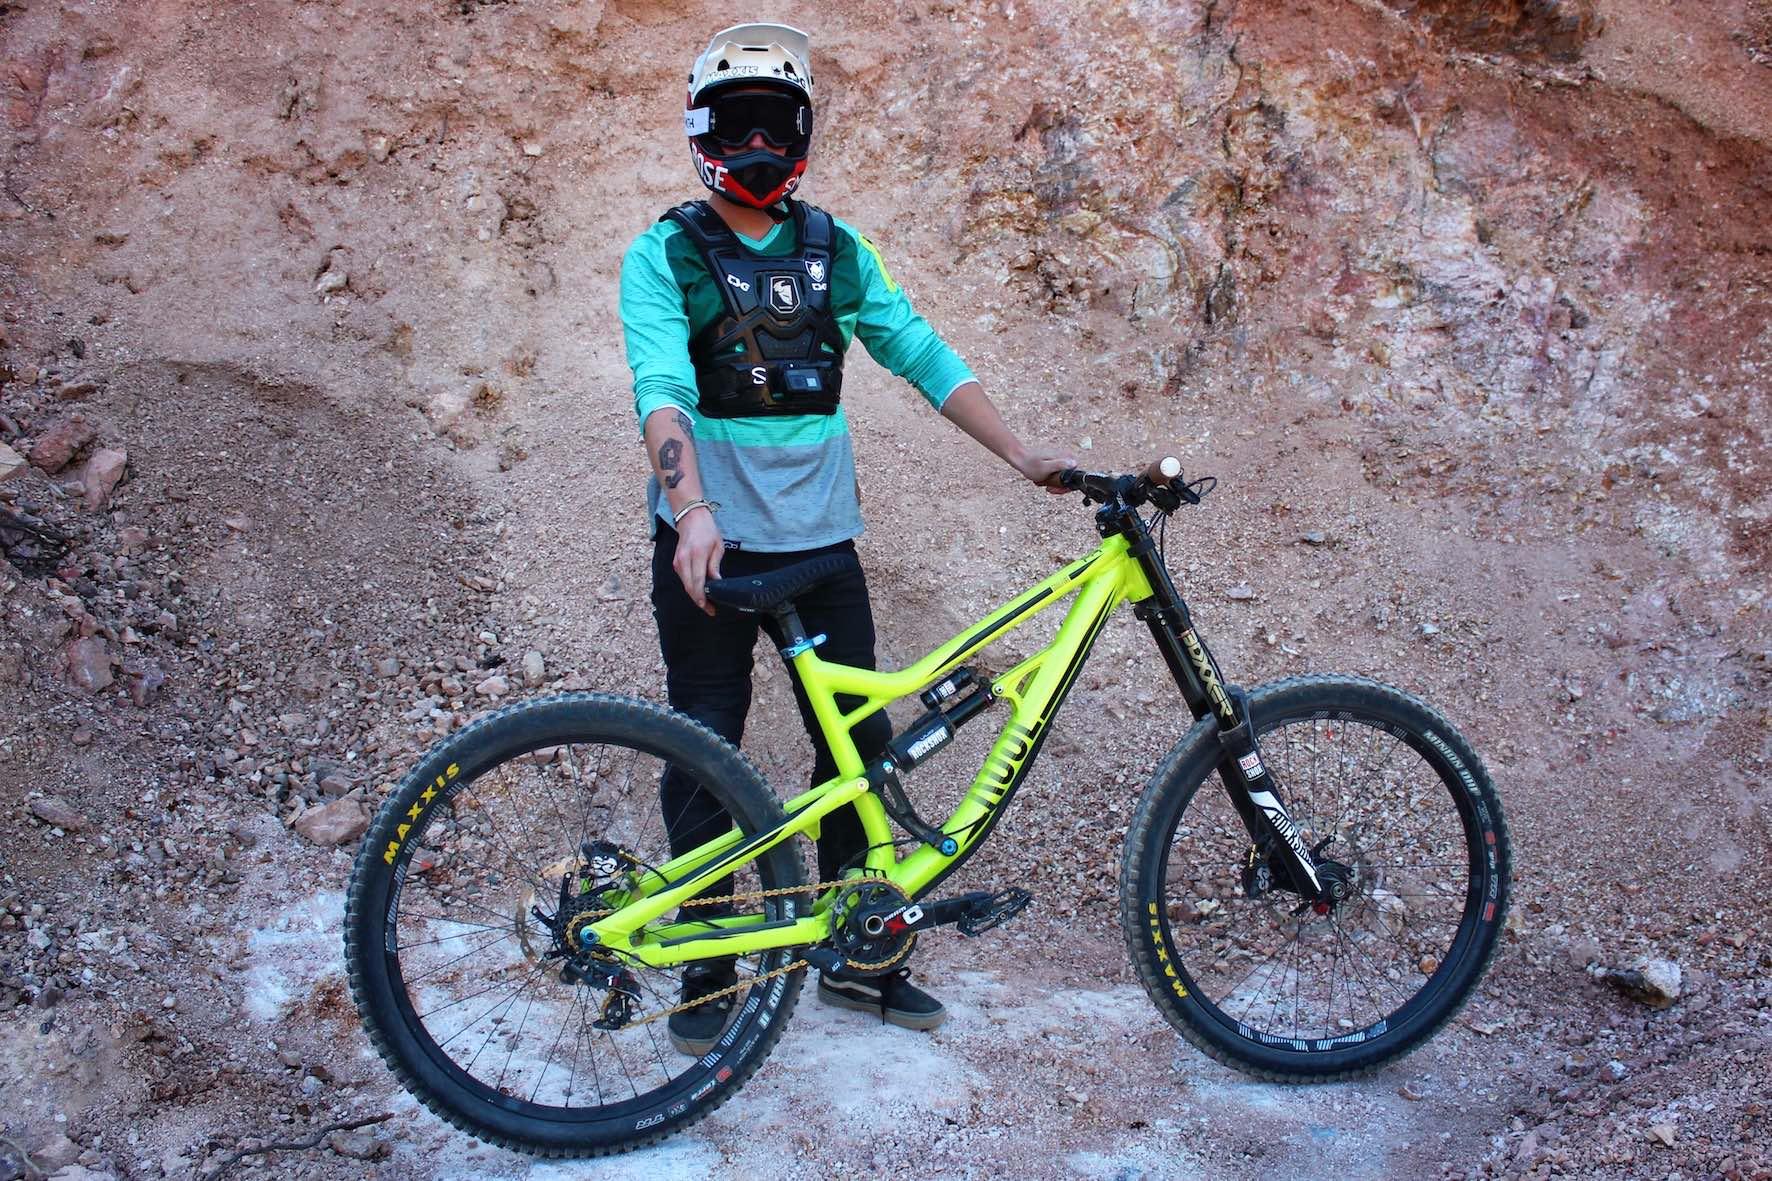 Tobi Wrobel Rose SoulFire Audi Nines bike